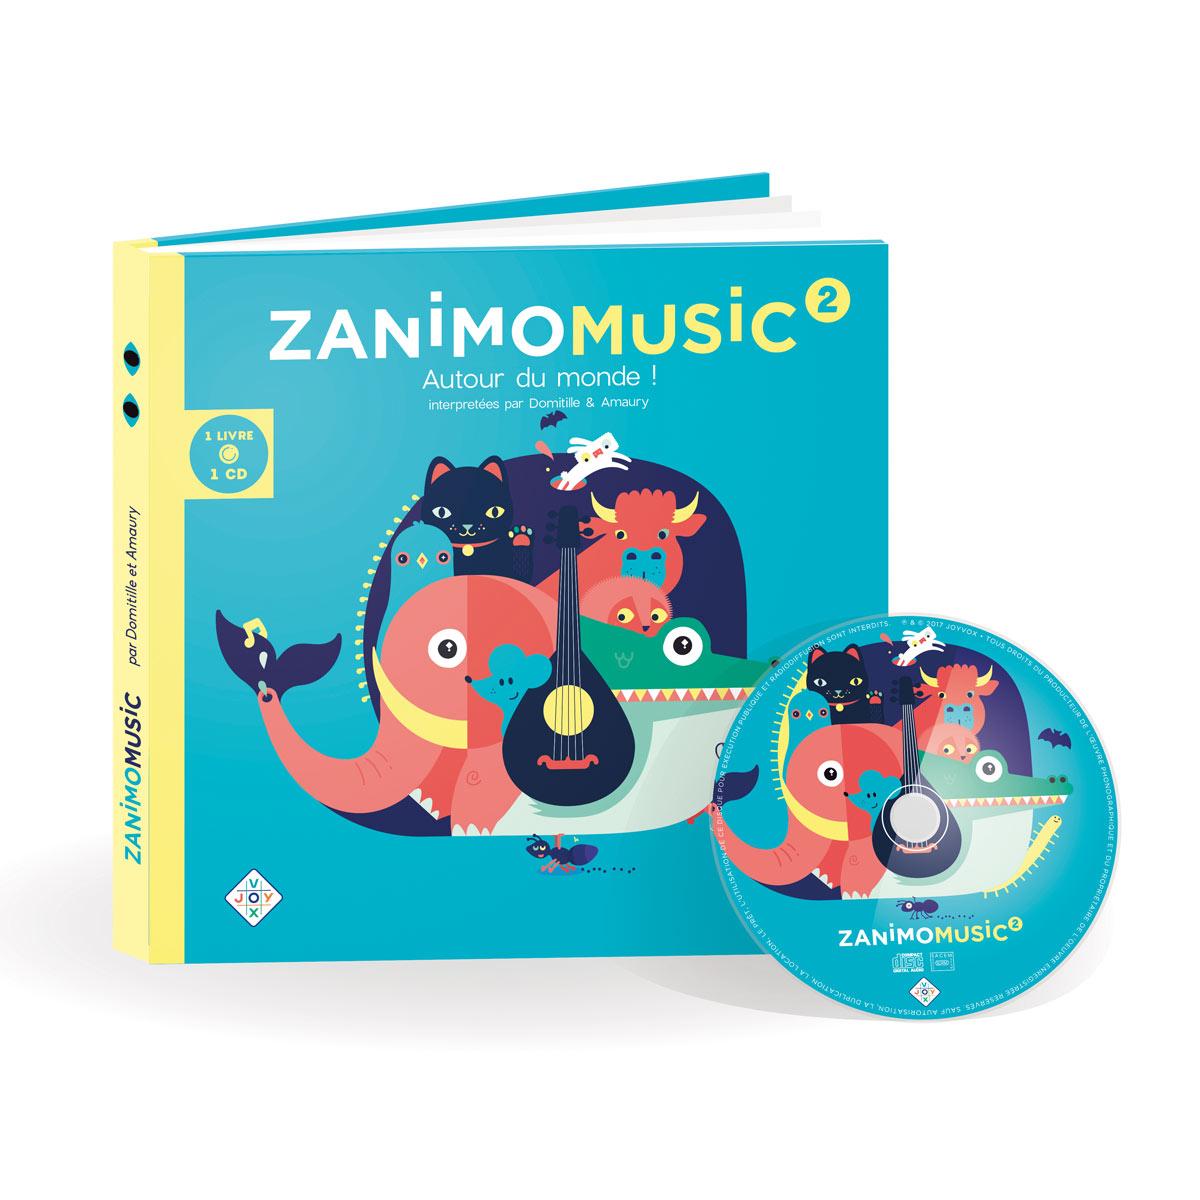 Zanimomusic 2 - Autour du monde